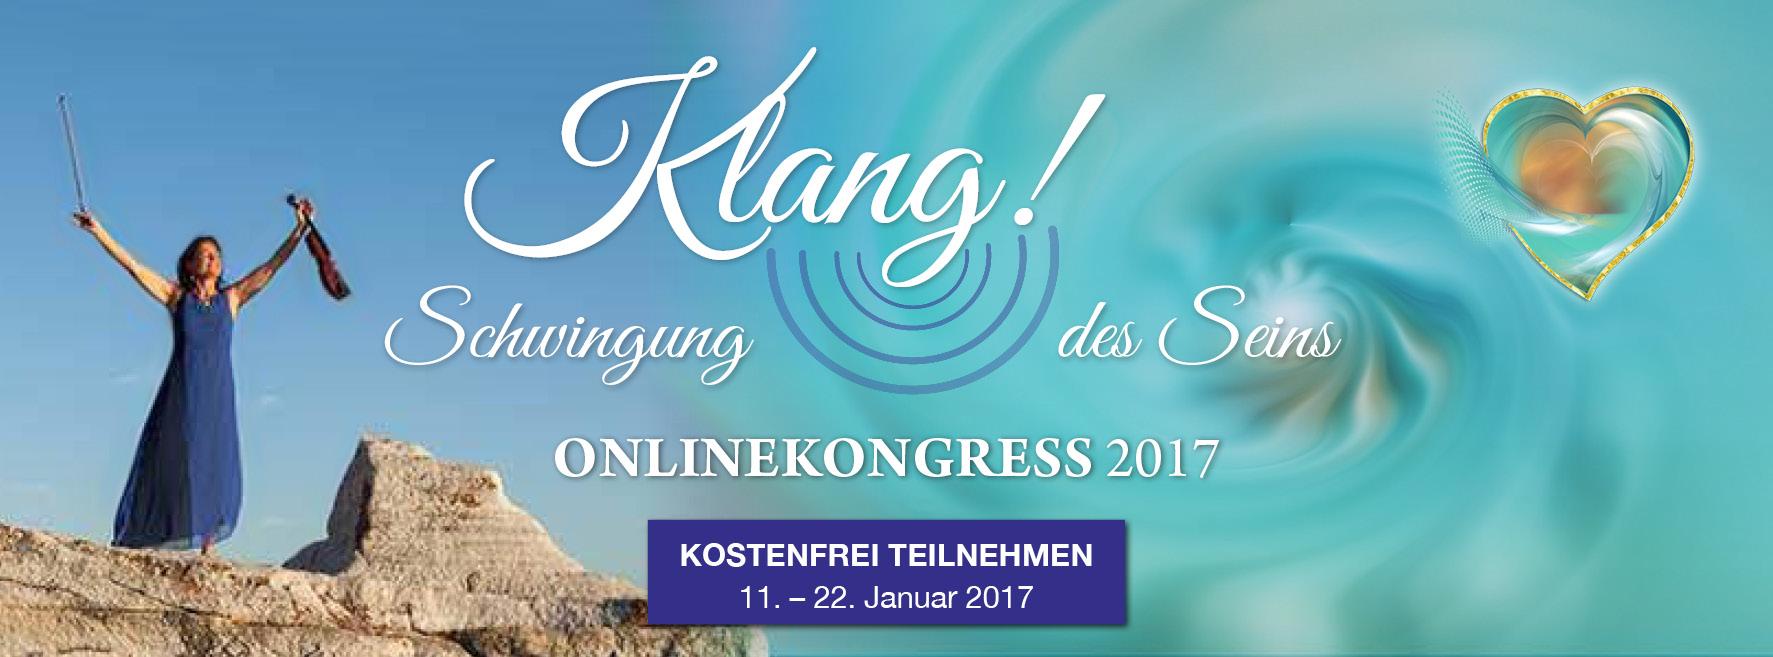 Online-Kongress-KLANGSchwingung-des-Seins (2)